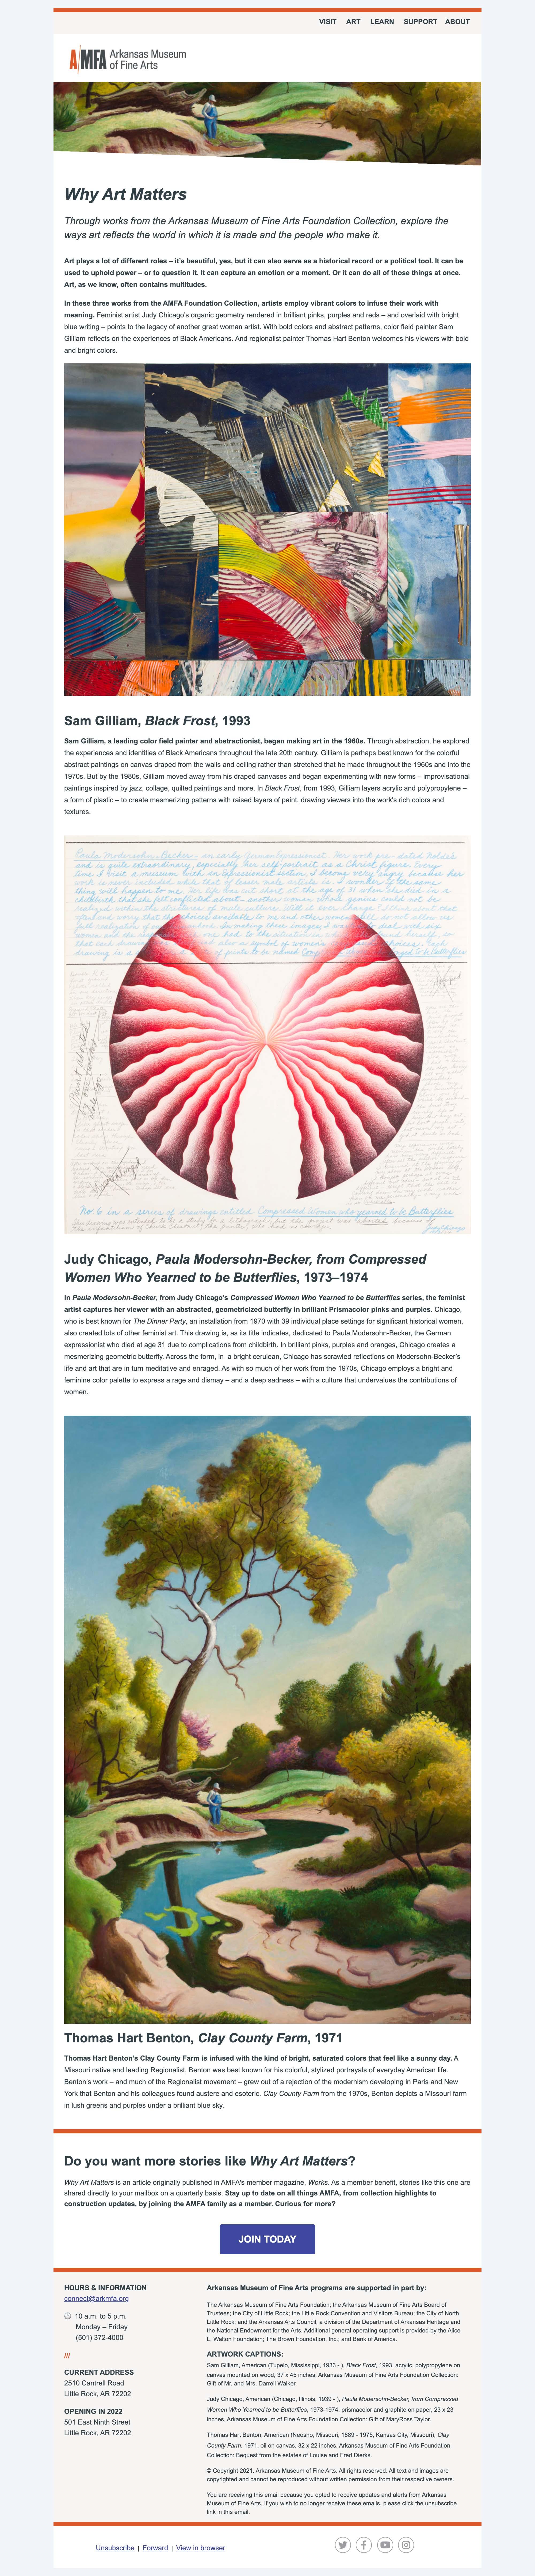 Question: Why does art matter? - desktop view